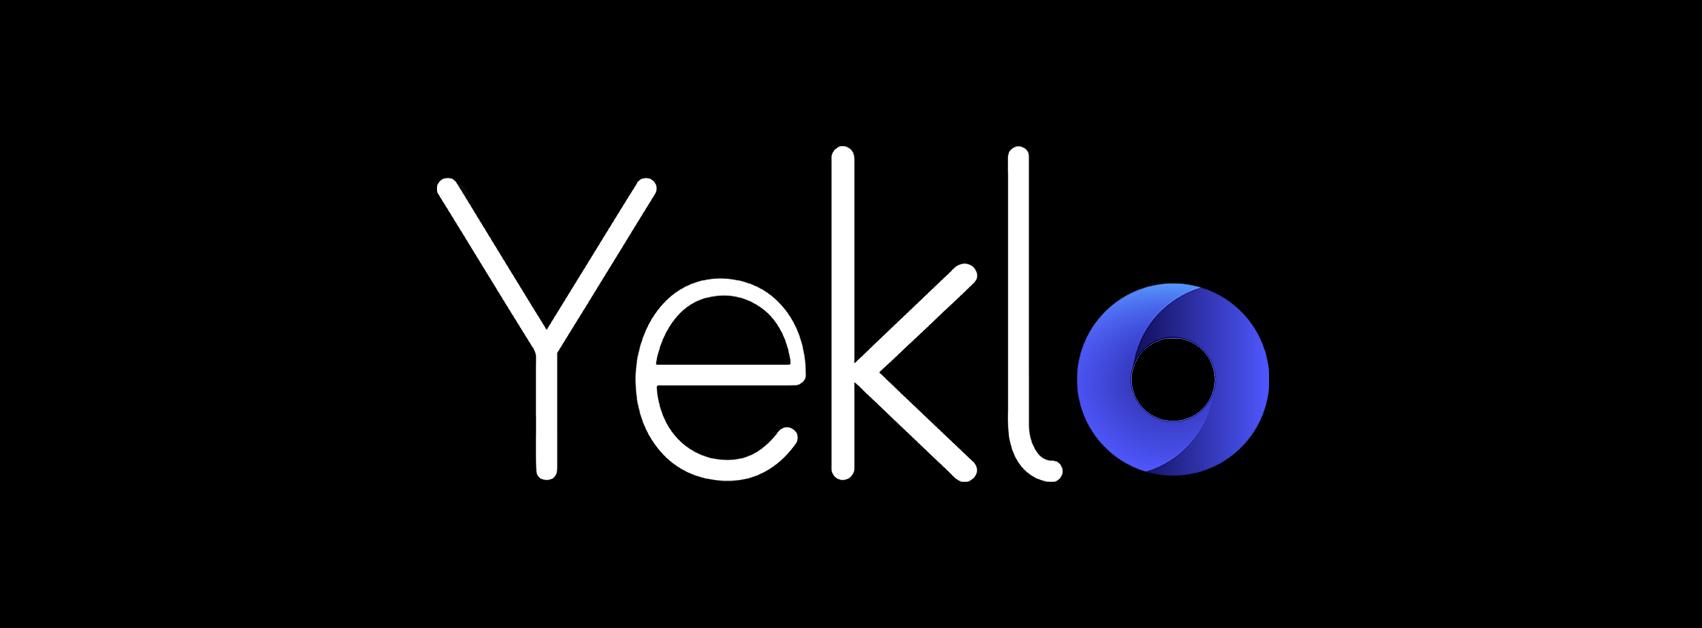 Yeklo